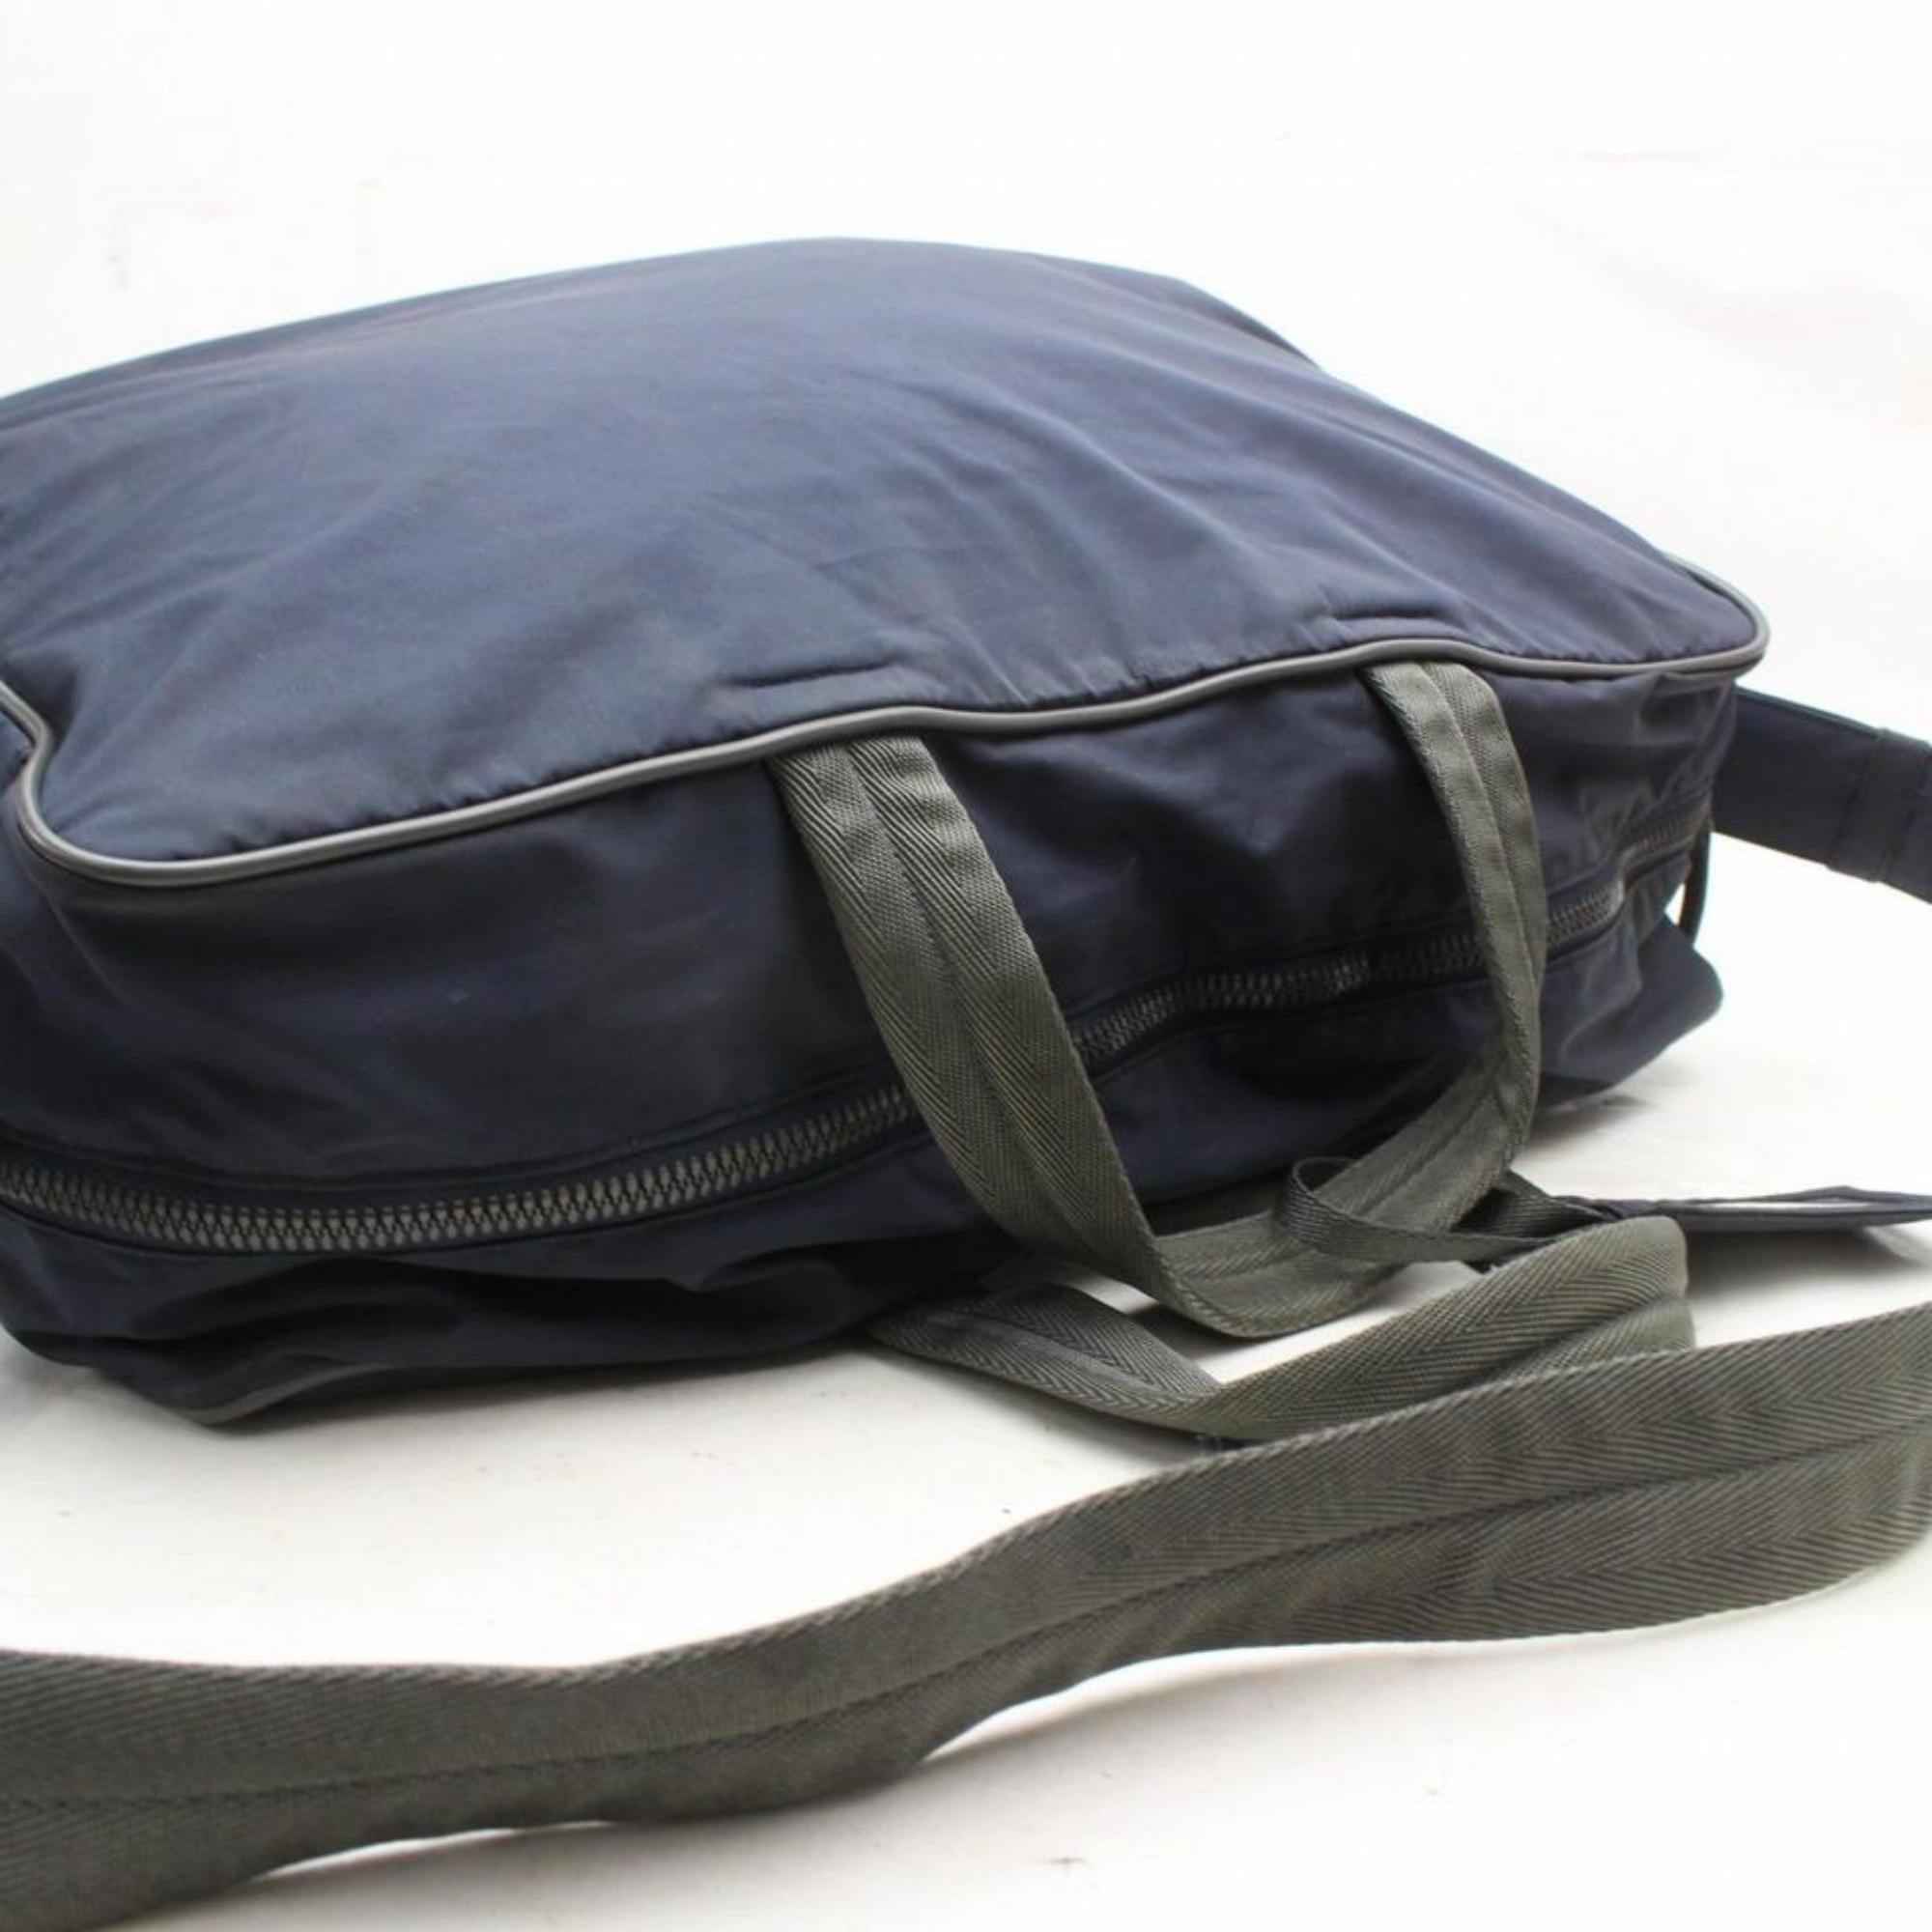 f7098ff7f5a5 Prada Tessuto Sports Duffle 2way 869246 Black Nylon Weekend/Travel Bag For  Sale at 1stdibs